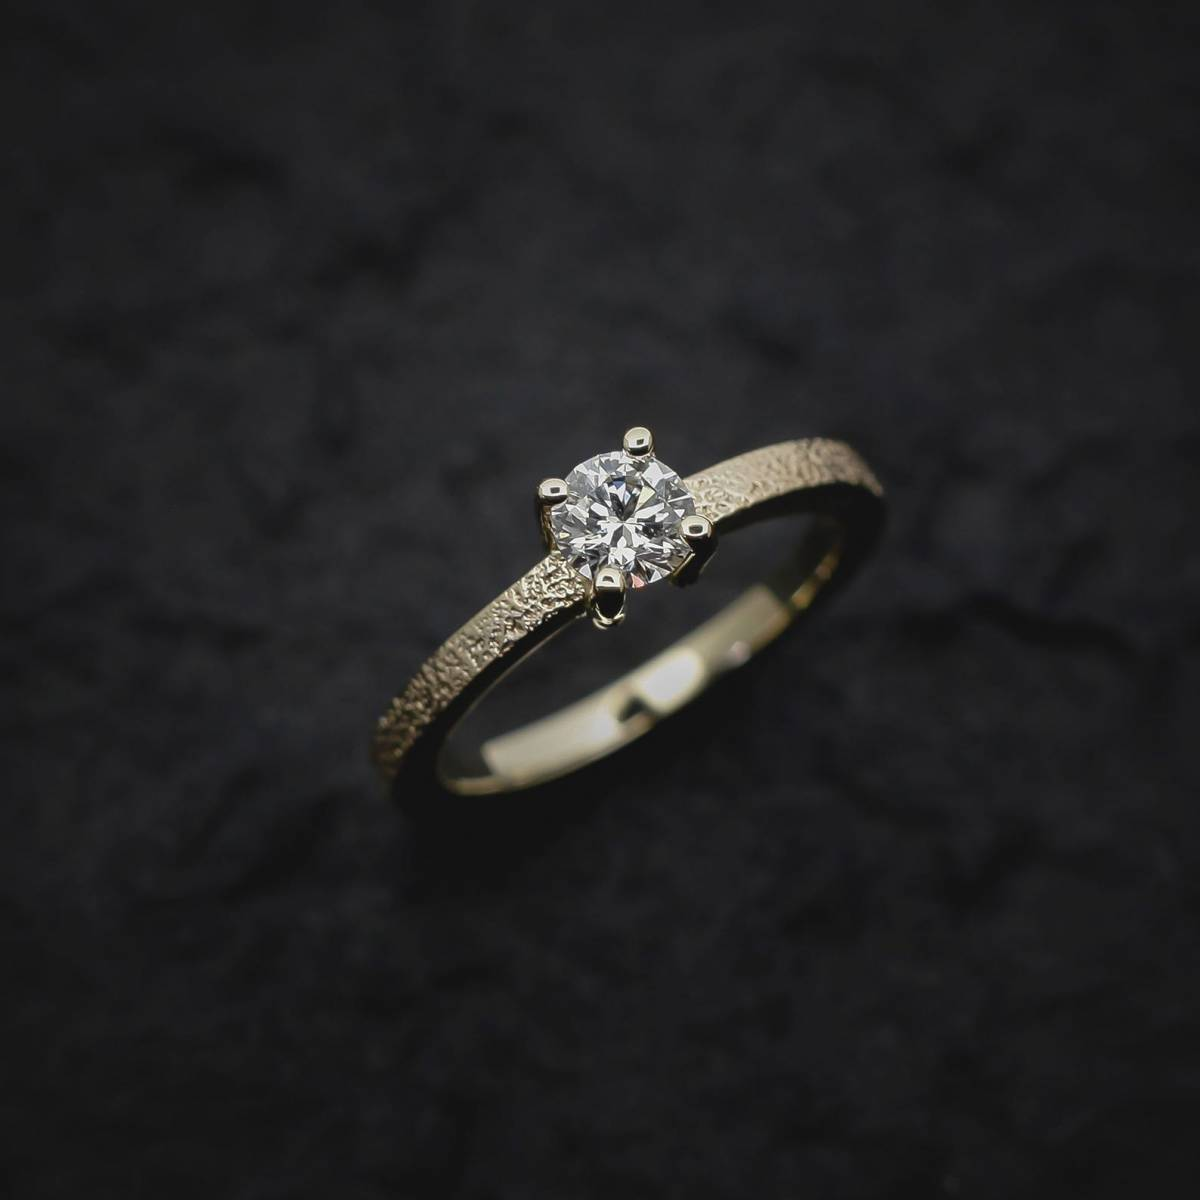 Jonas Maes Jewels - Juwelen - Bruidsjuwelen - Verlovingsring - Trouwring - House of Weddings - 21